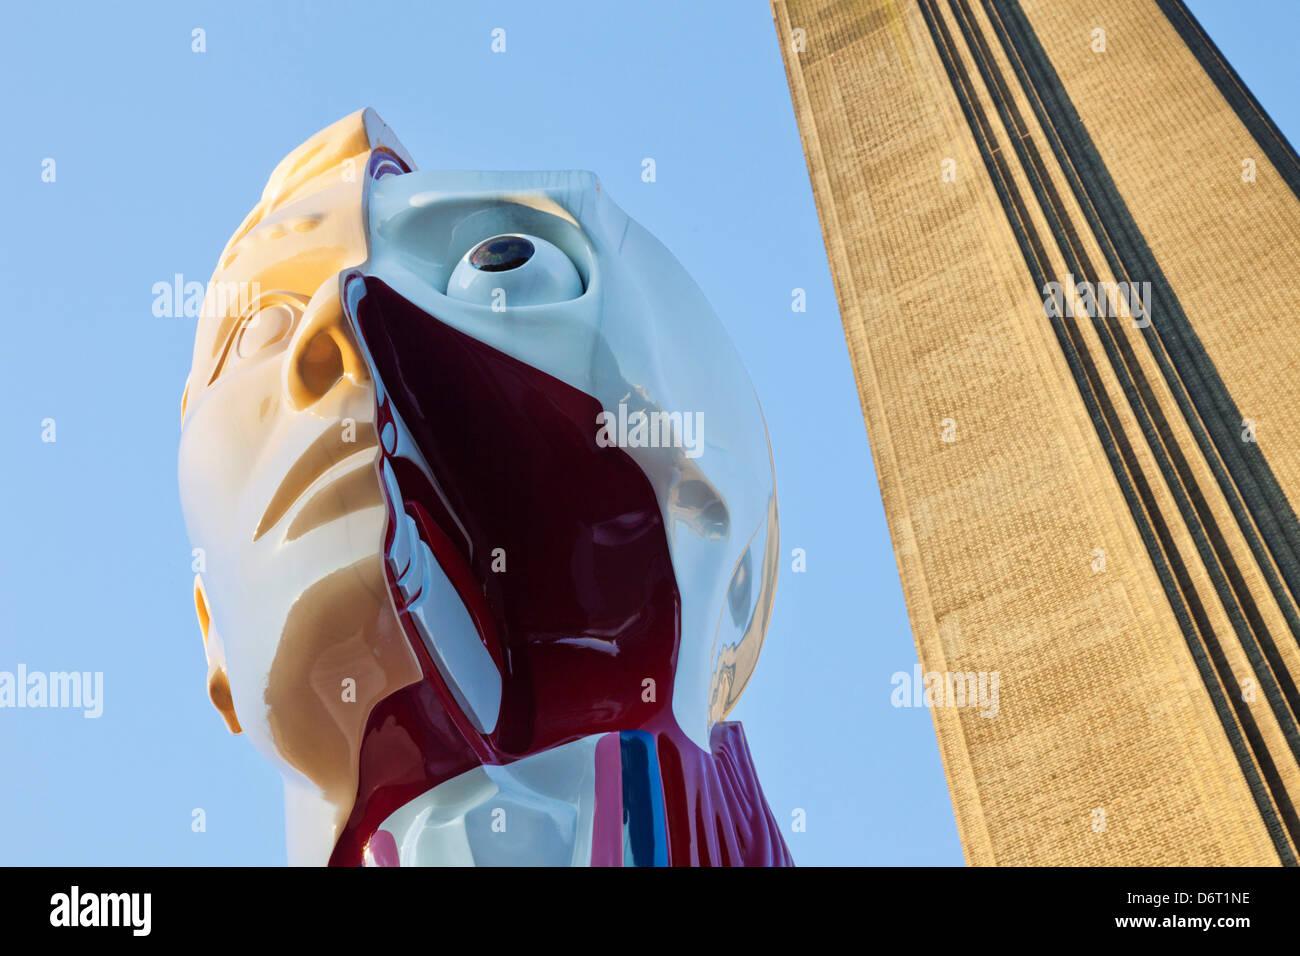 UK, London, Bankside, Tate Modern, Sculpture titled ''Hymn'' by Damien Hurst - Stock Image